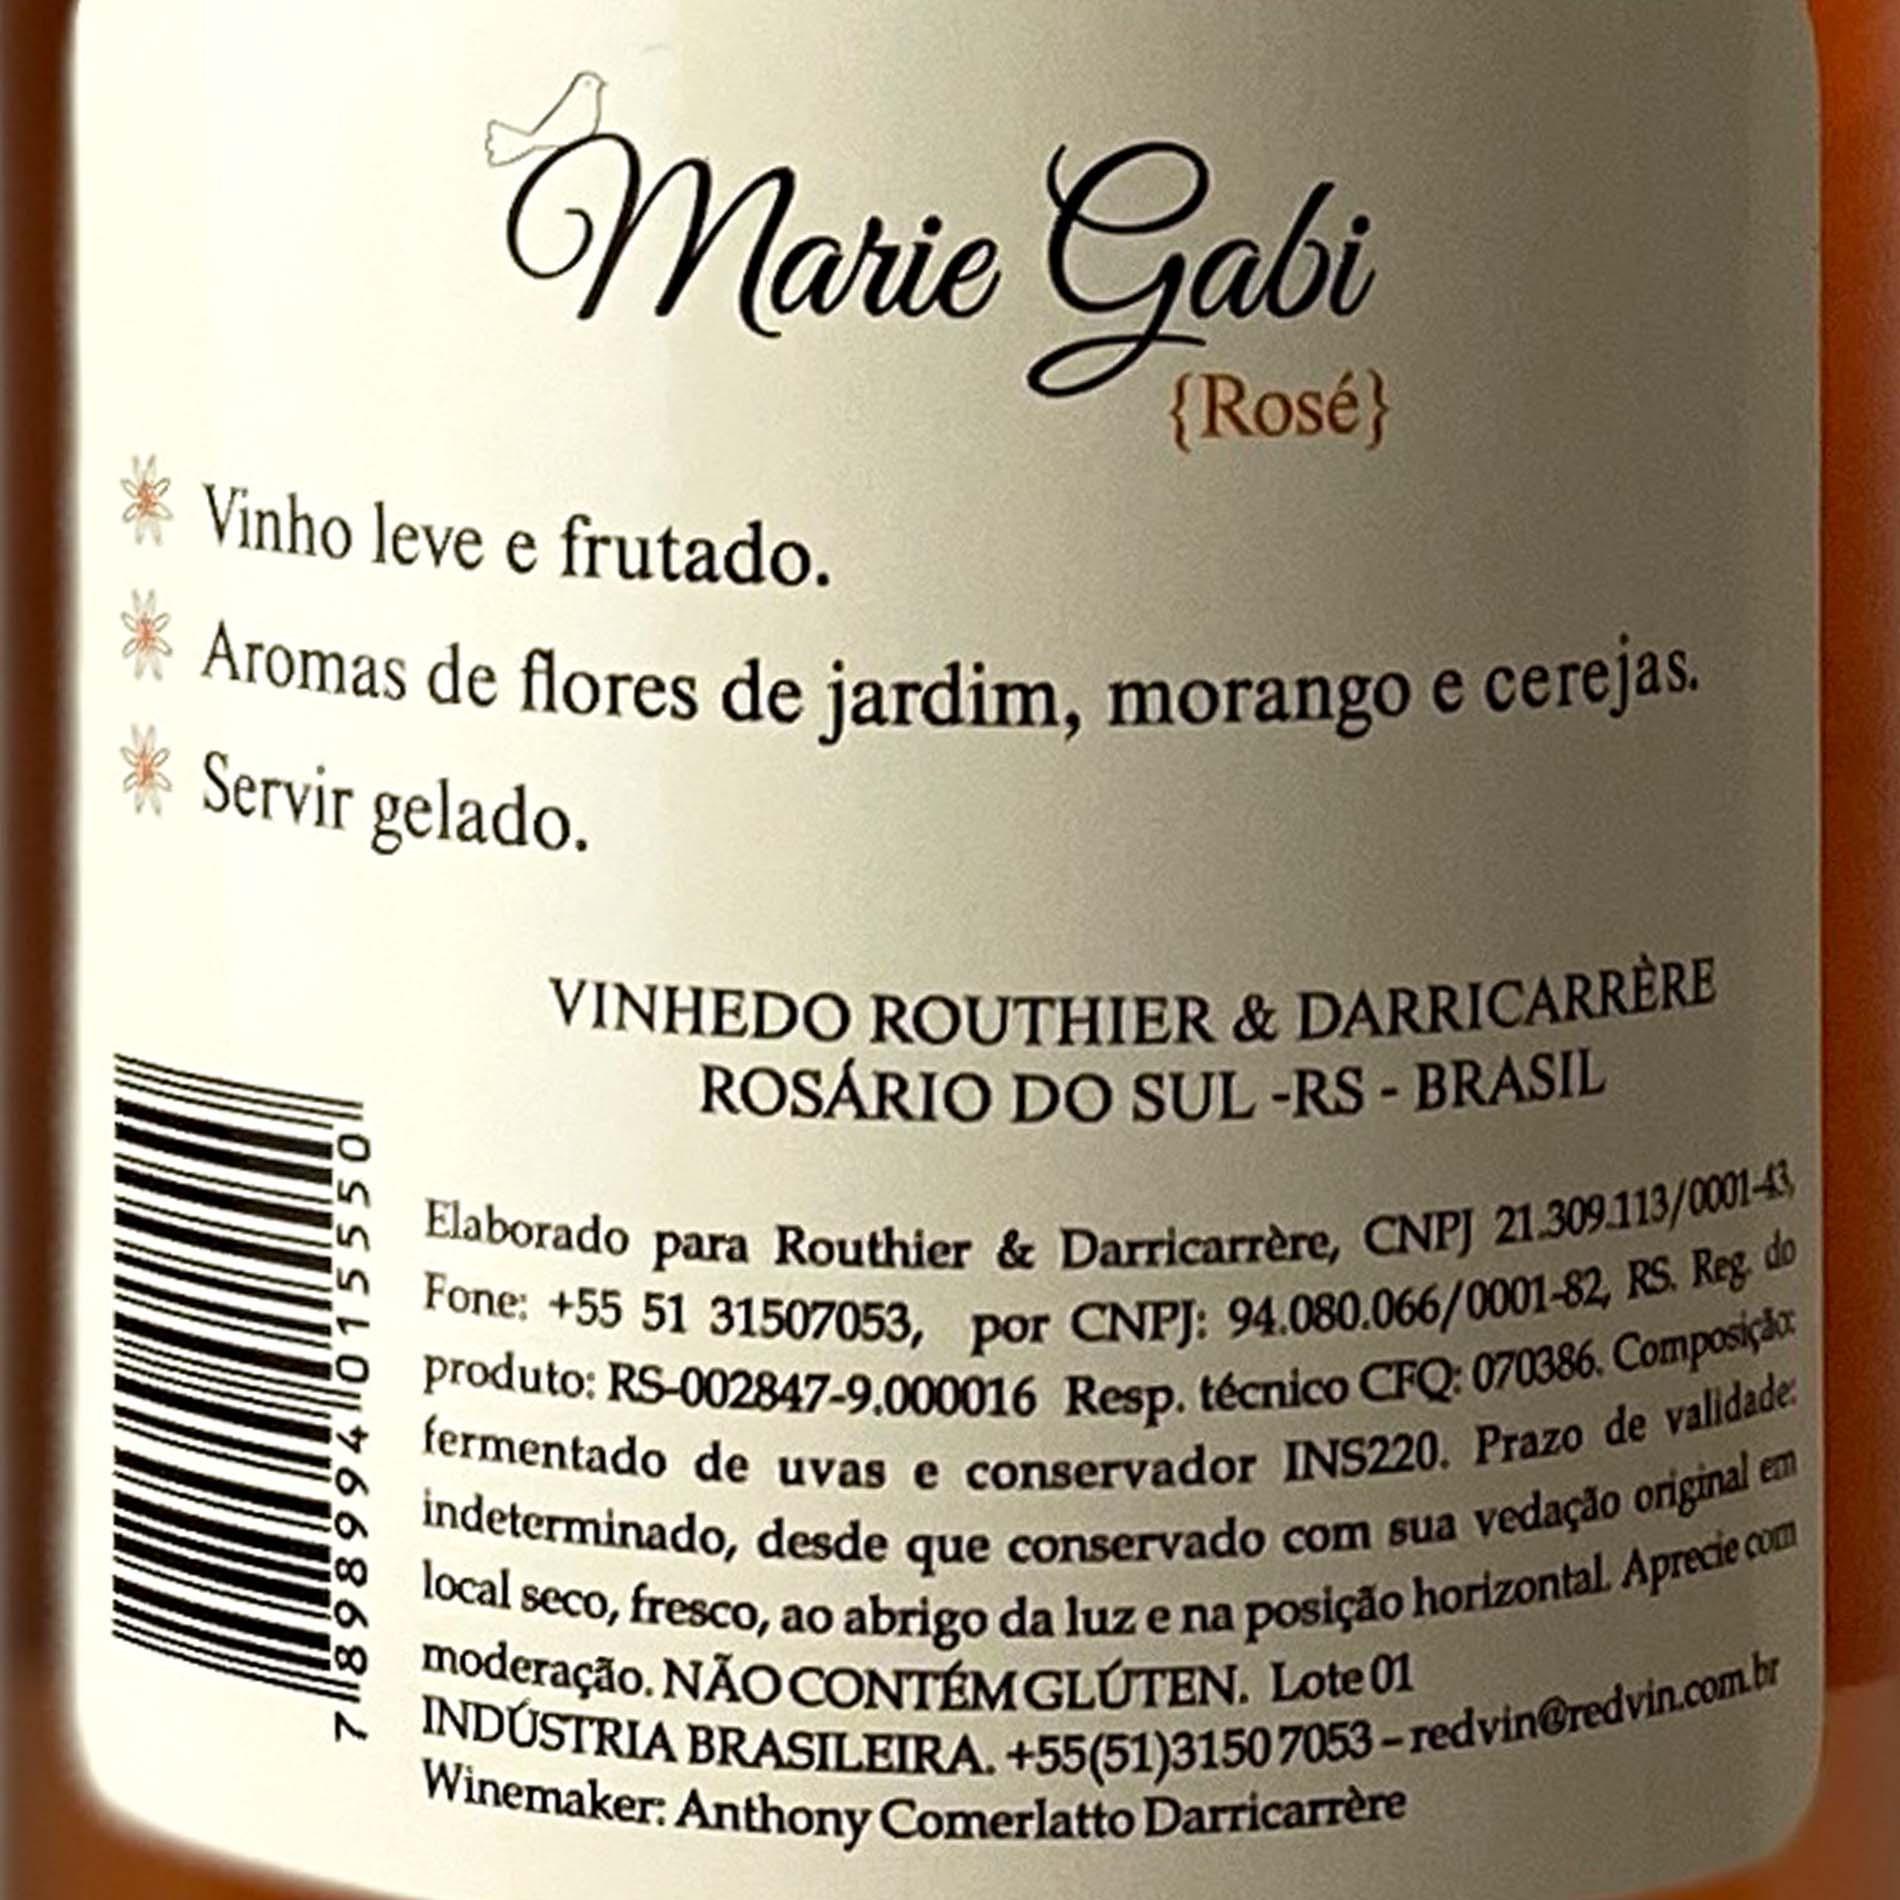 Marie Gabi Rosé  - Vinerize